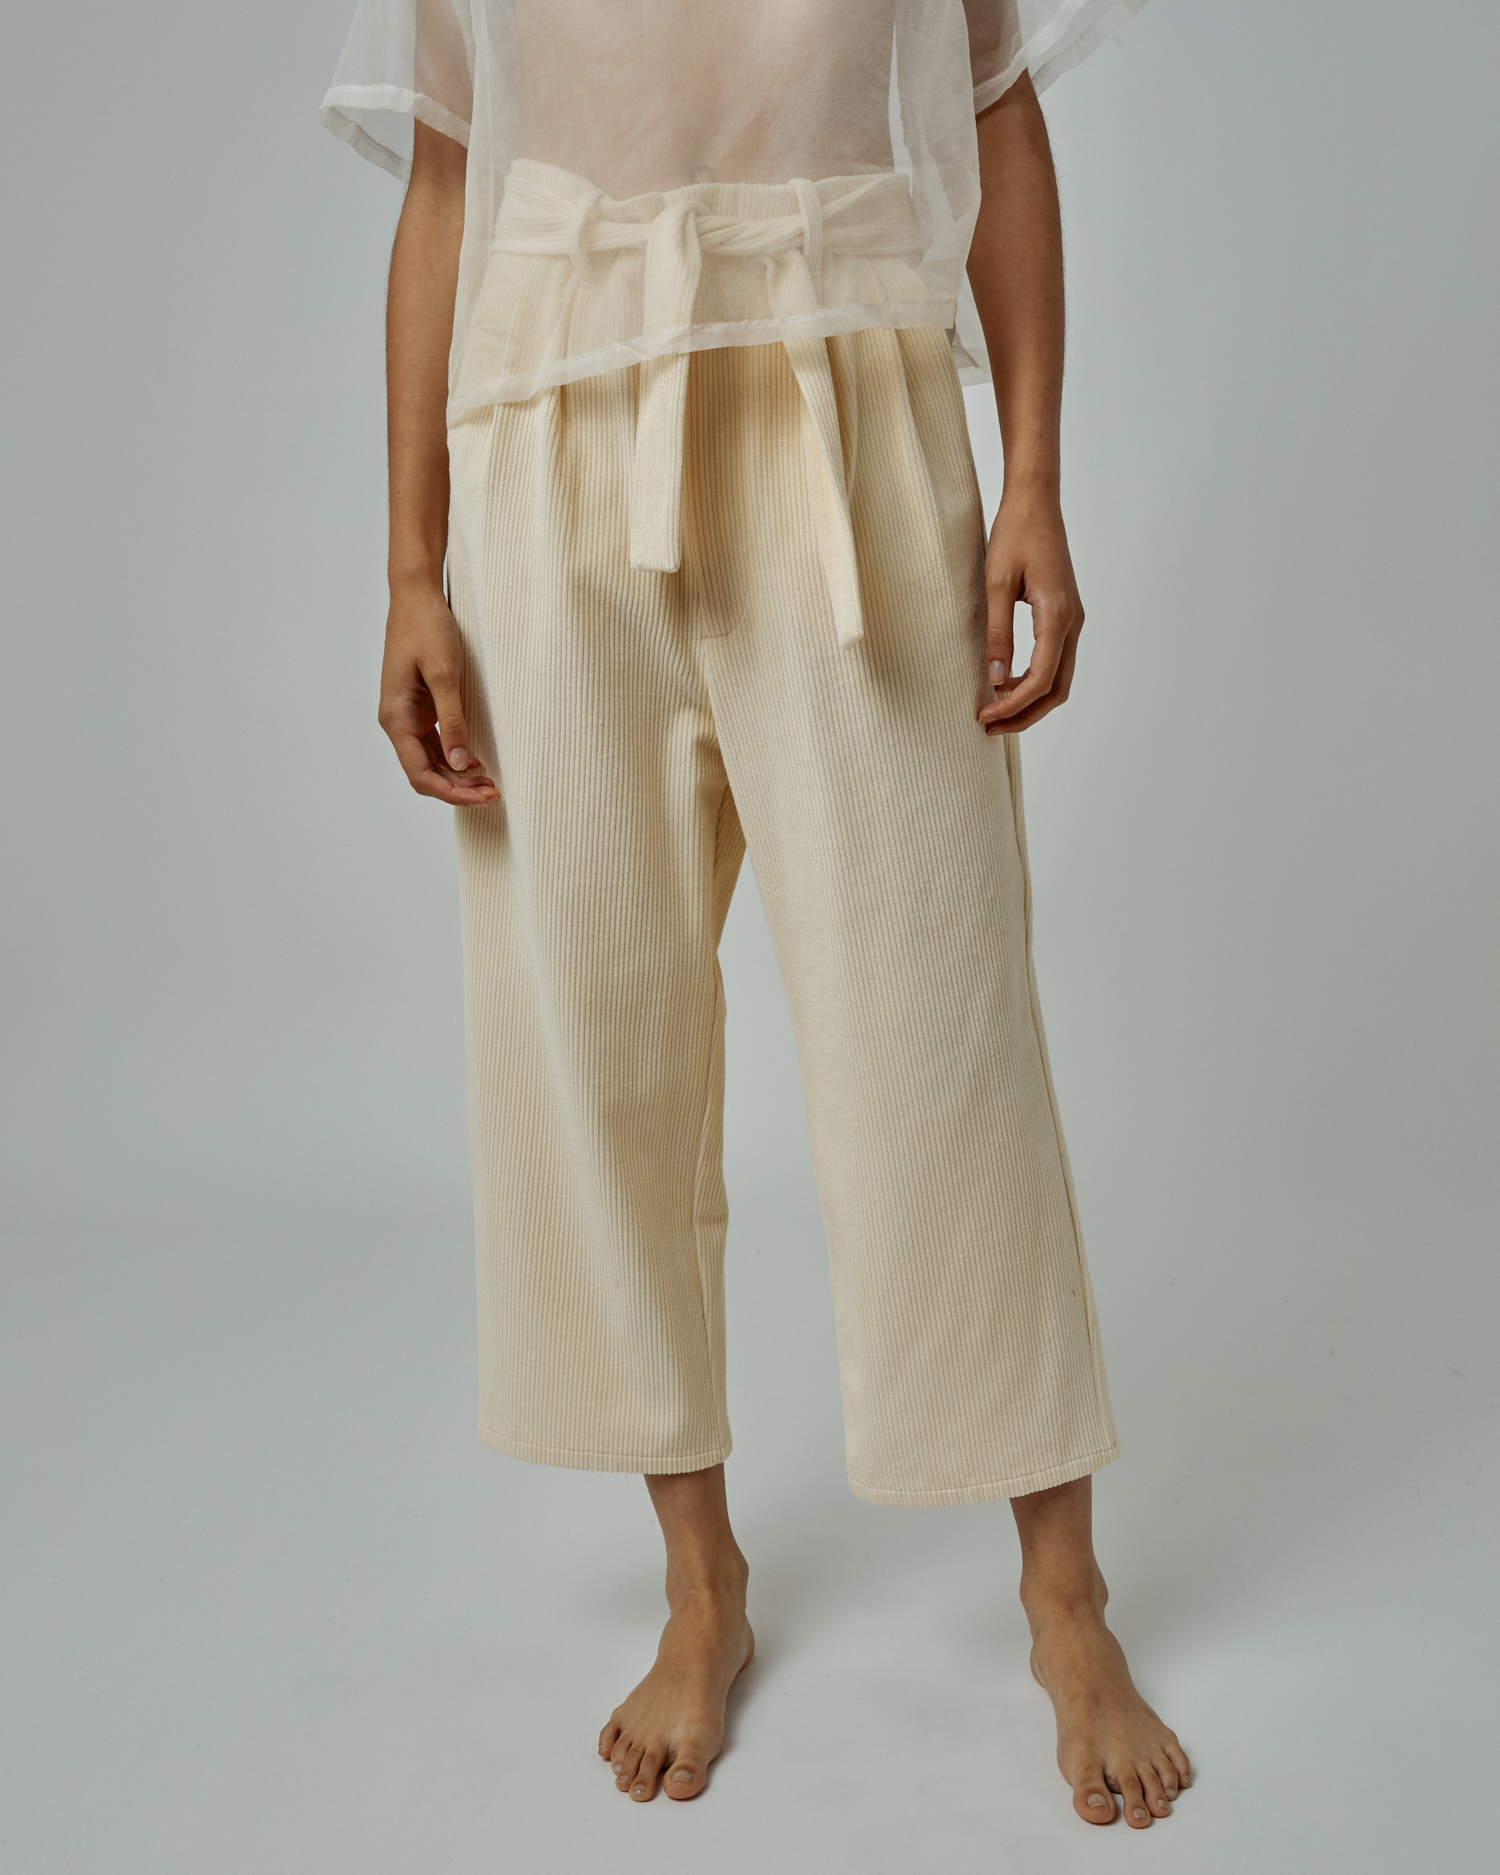 Wide-Leg Paperbag-Waist Pant In Corduroy